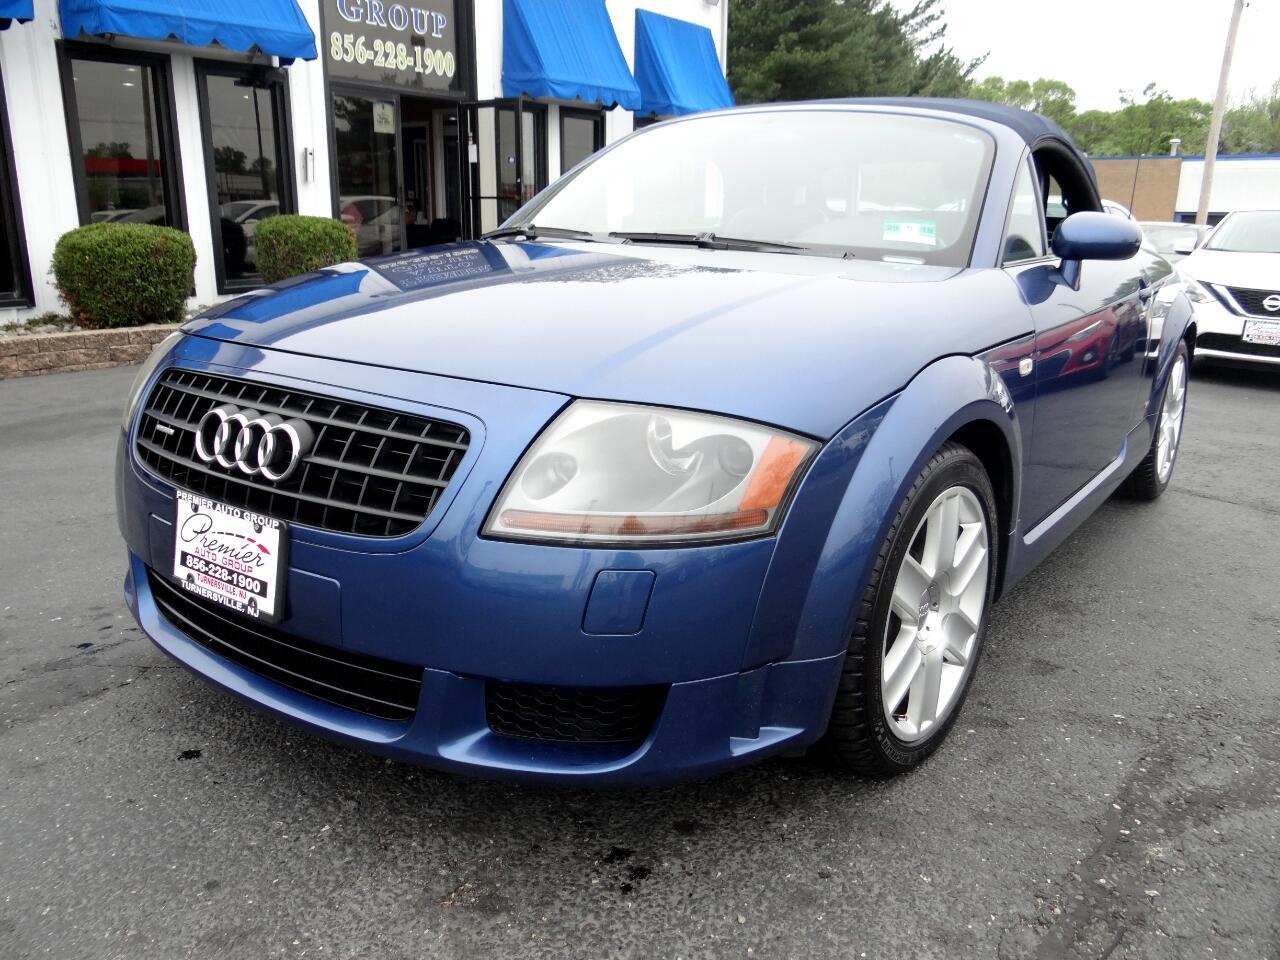 Audi TT 2004 for Sale in Blackwood, NJ